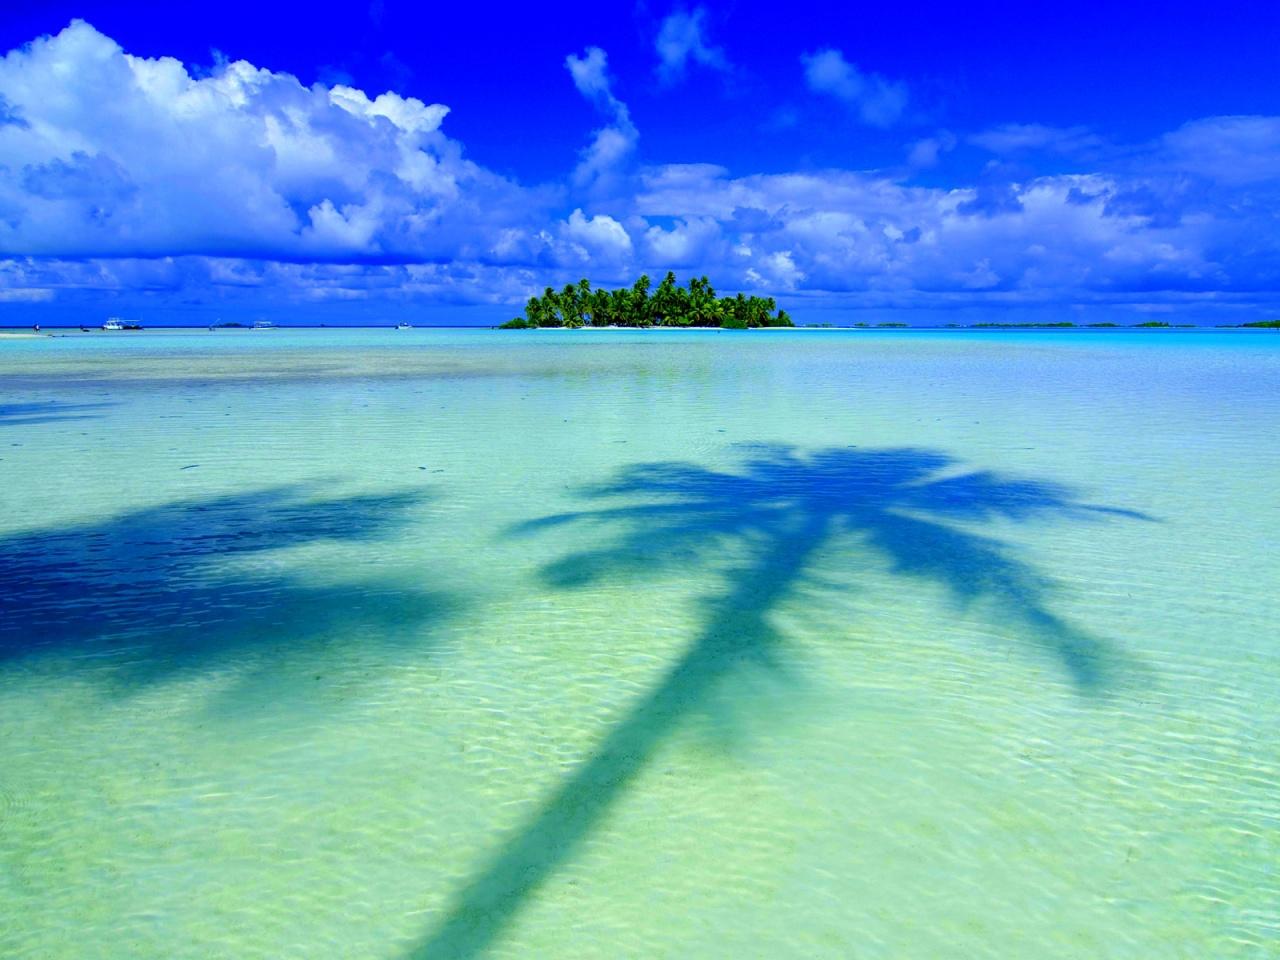 Island Panorama 1280x960 wallpaper1280X960 wallpaper screensaver 1280x960